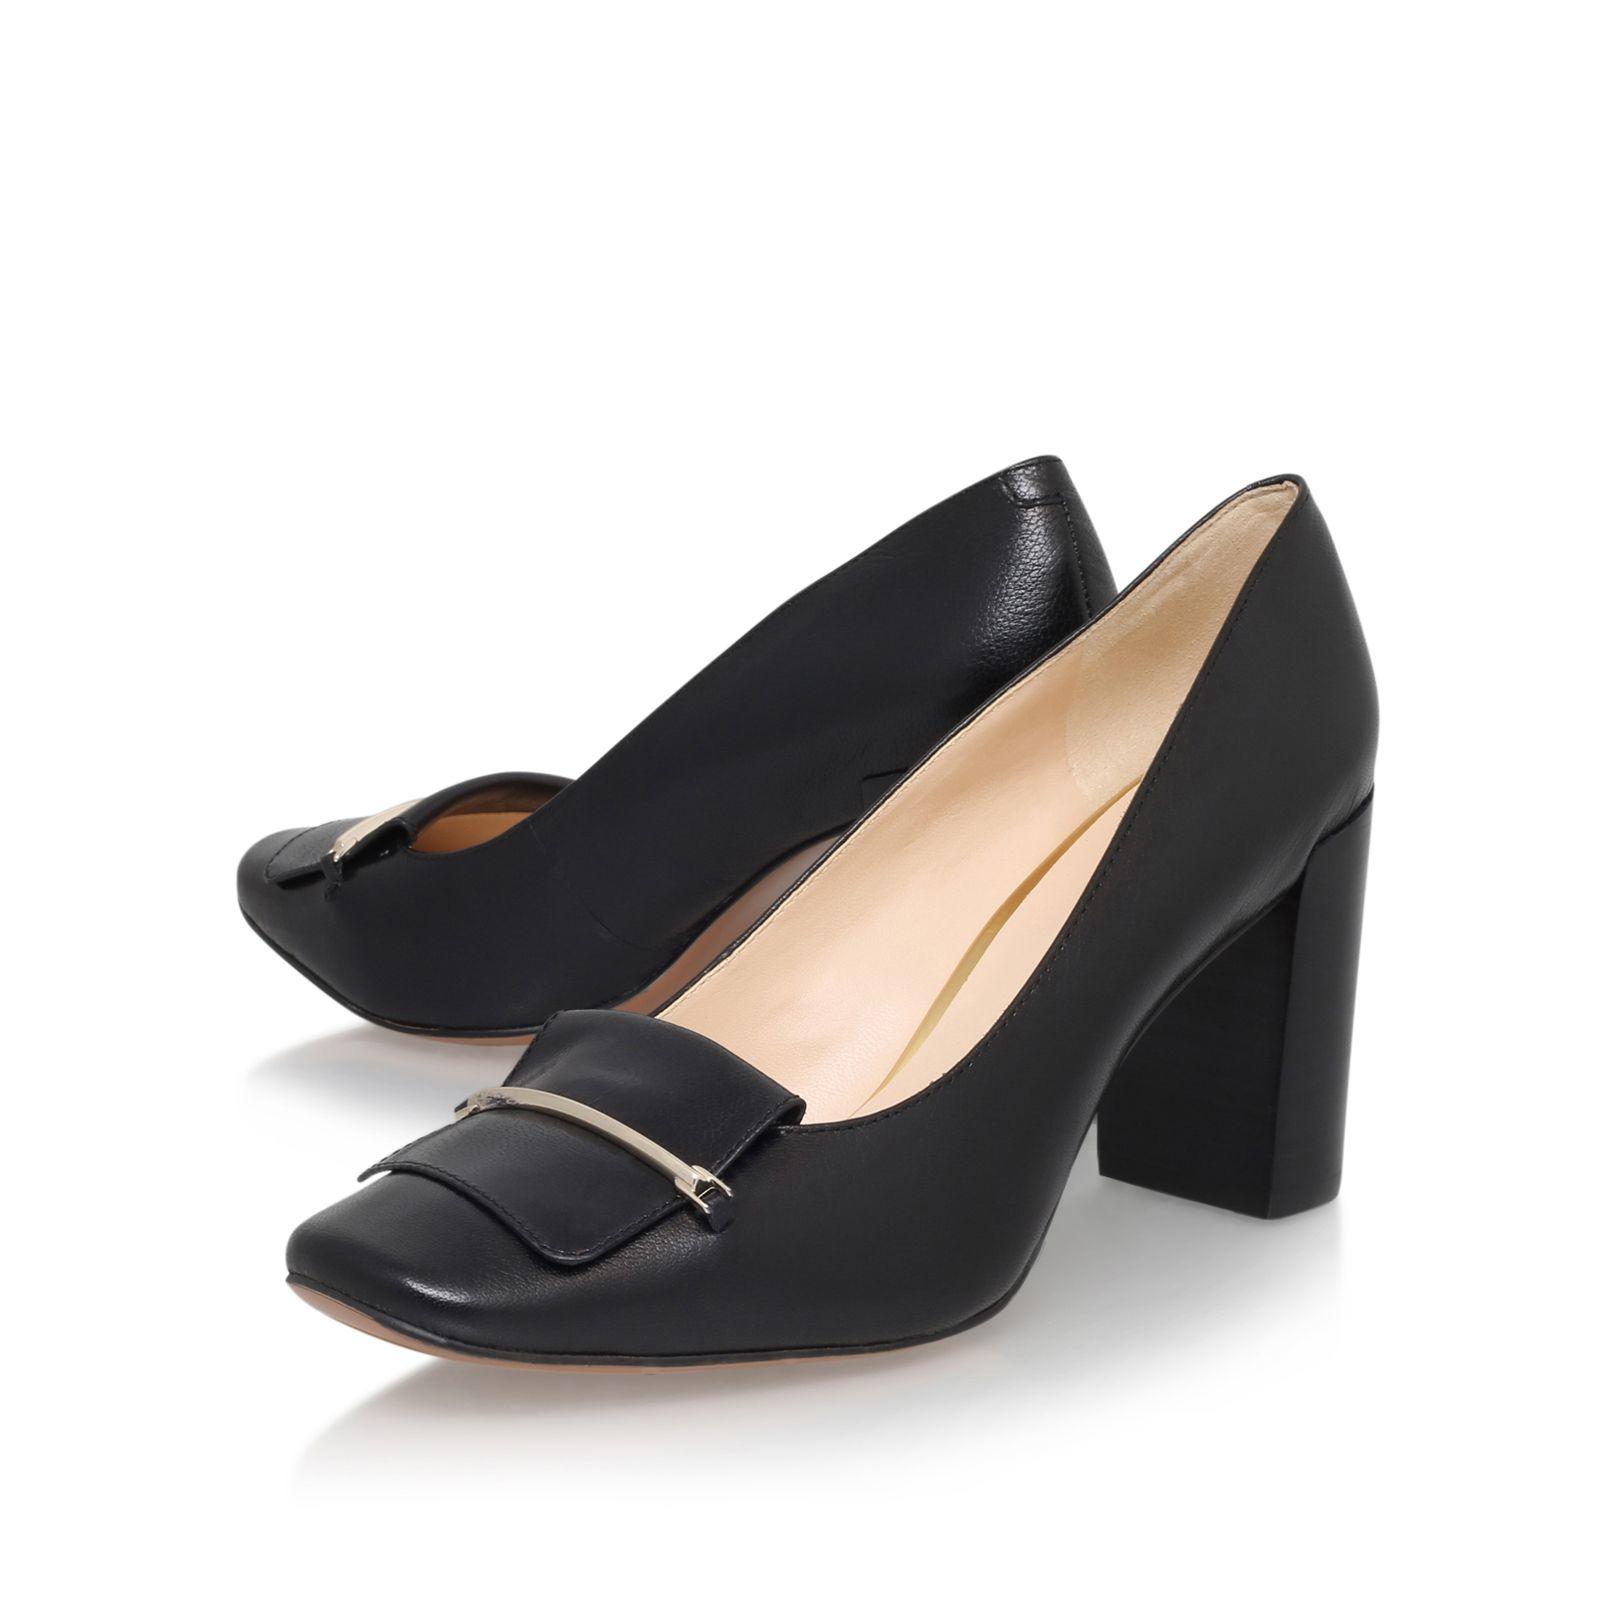 nine west newgyrl mid block heel court shoes in black lyst